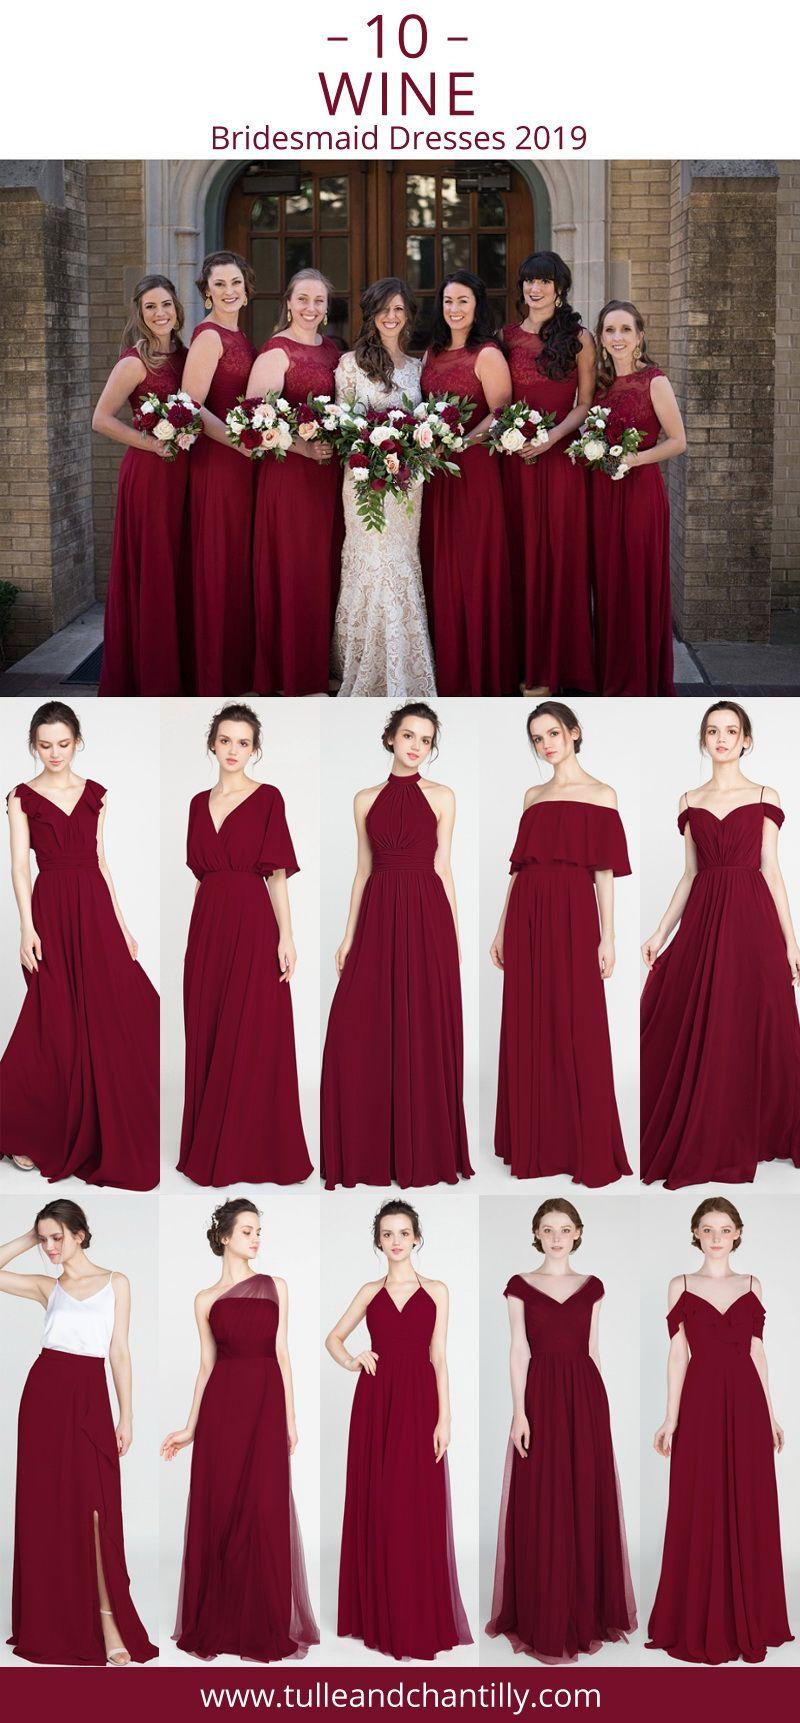 Top 10 Wine Bridesmaid Dresses For Wedding Season 2019 Wedding Weddinginspiration Wine Bridesmaid Dresses Fall Bridesmaid Dresses Winter Bridesmaid Dresses